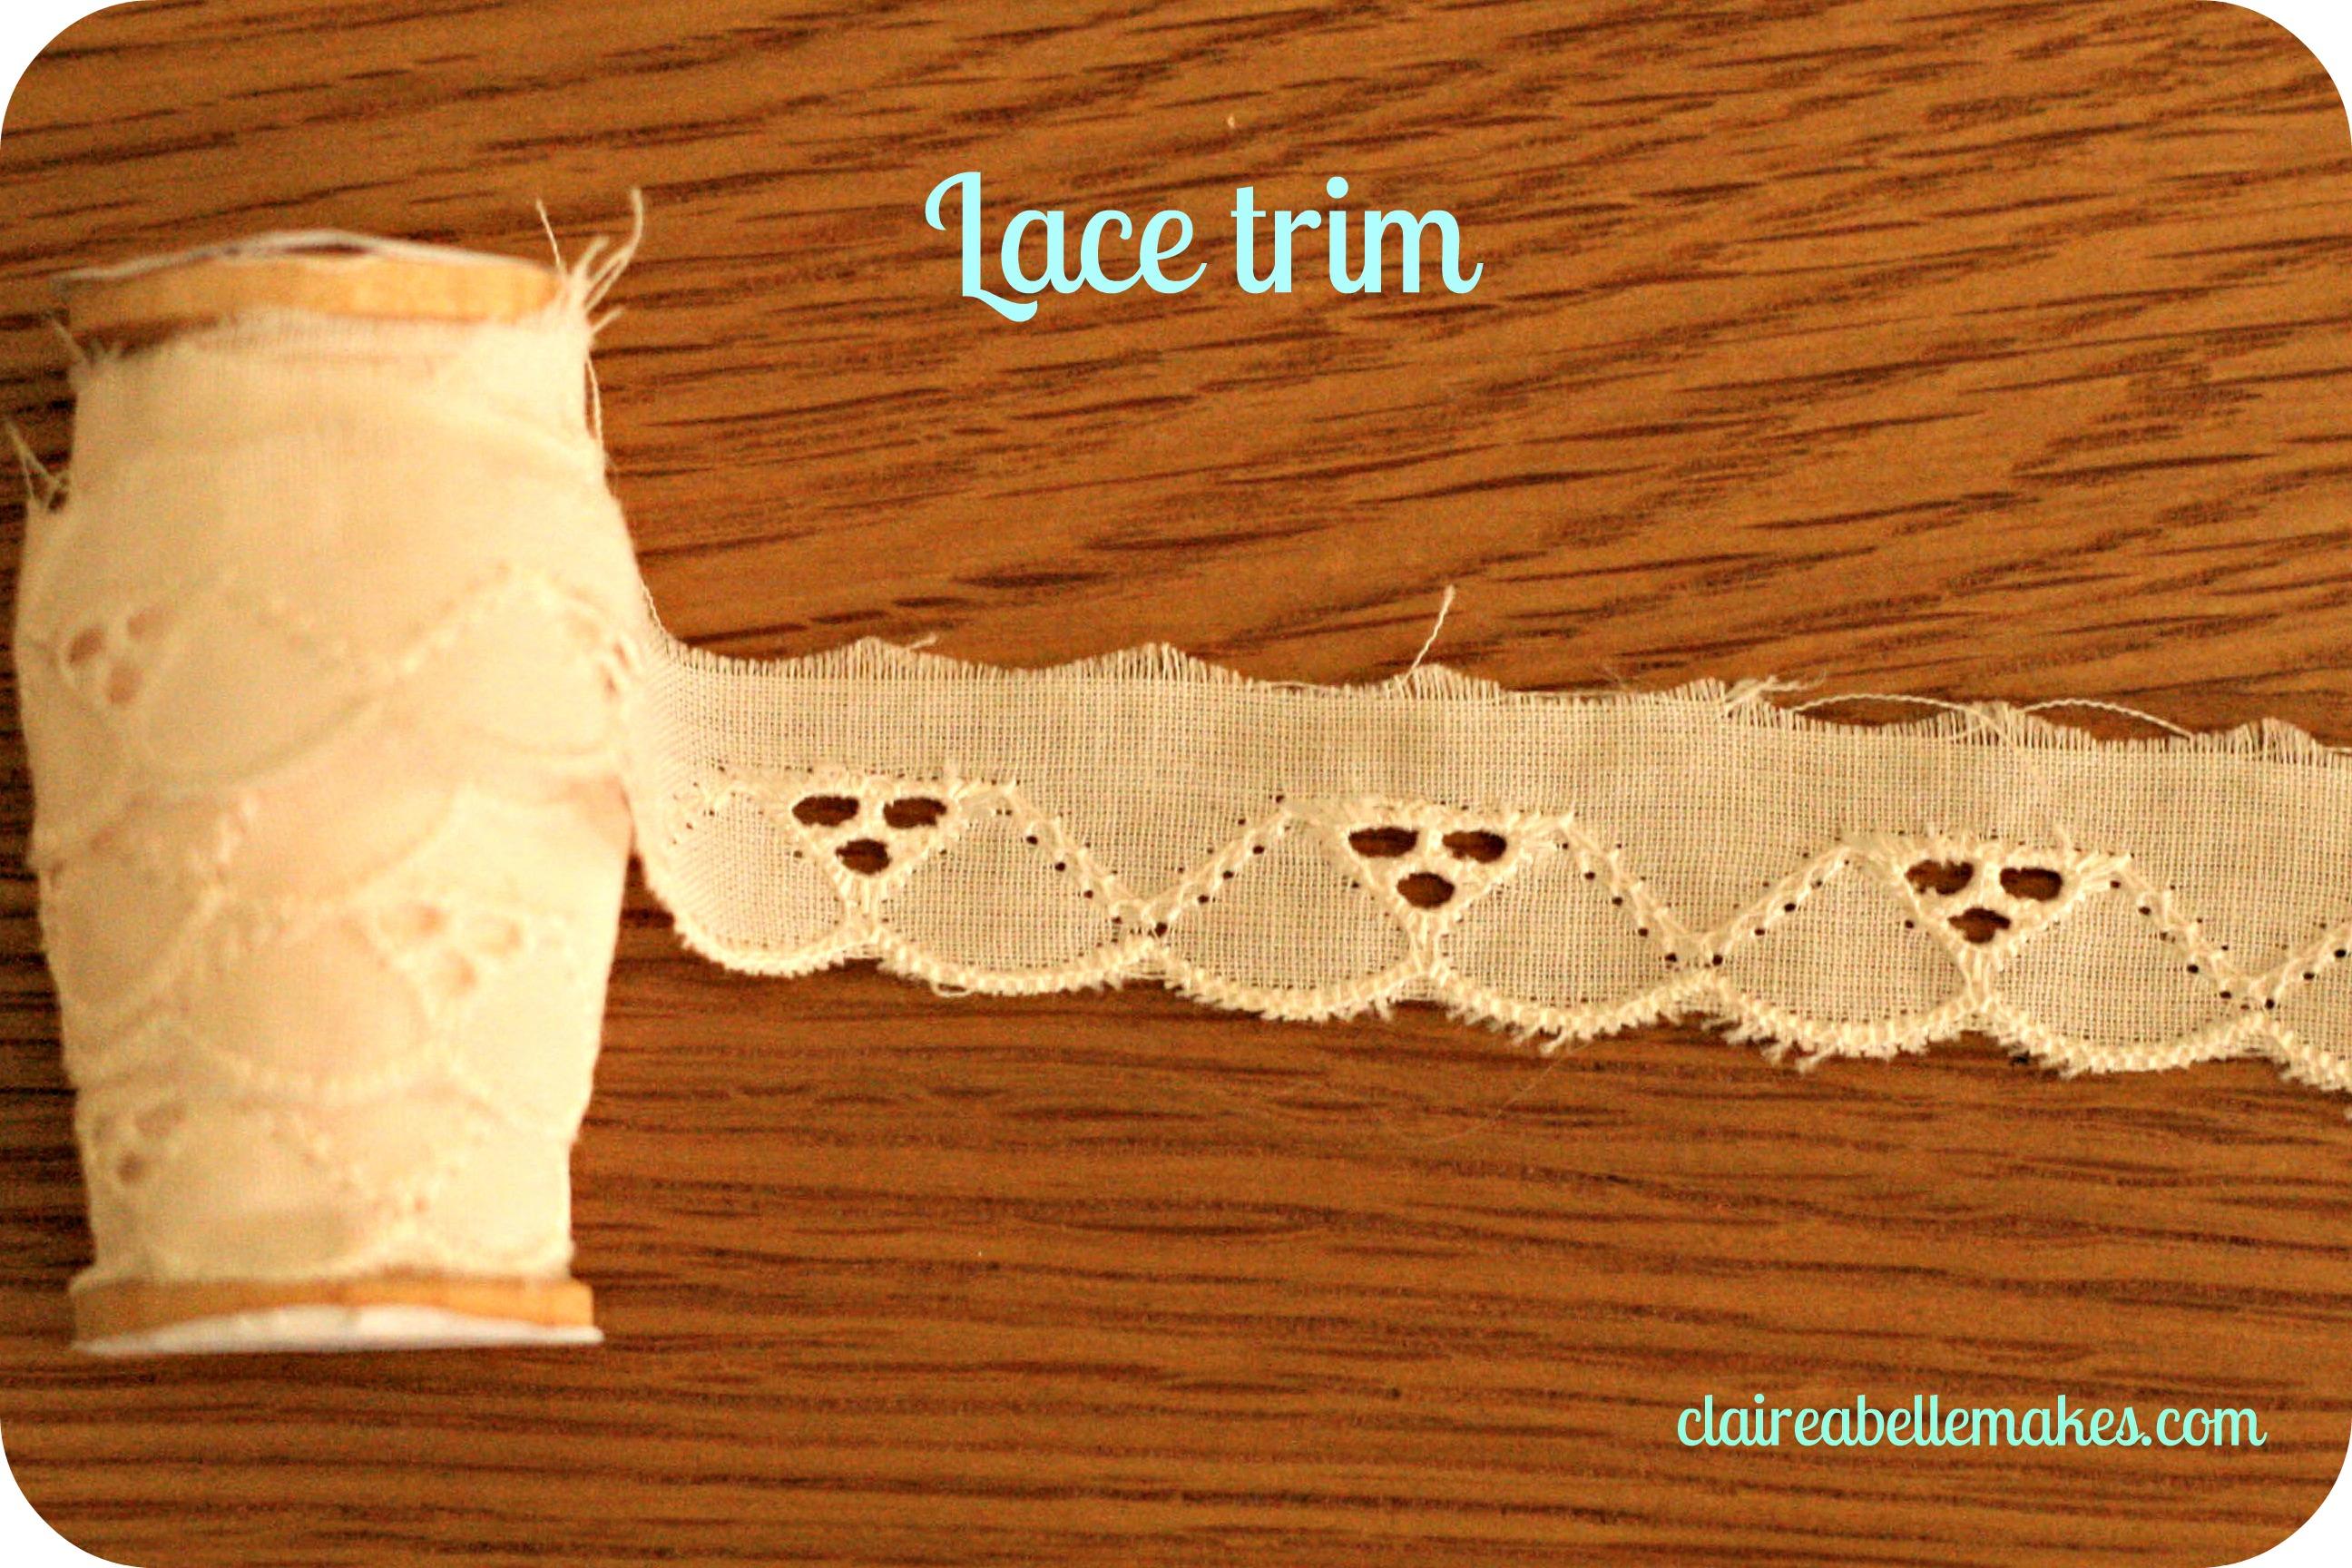 Lace Trim: claireabellemakes